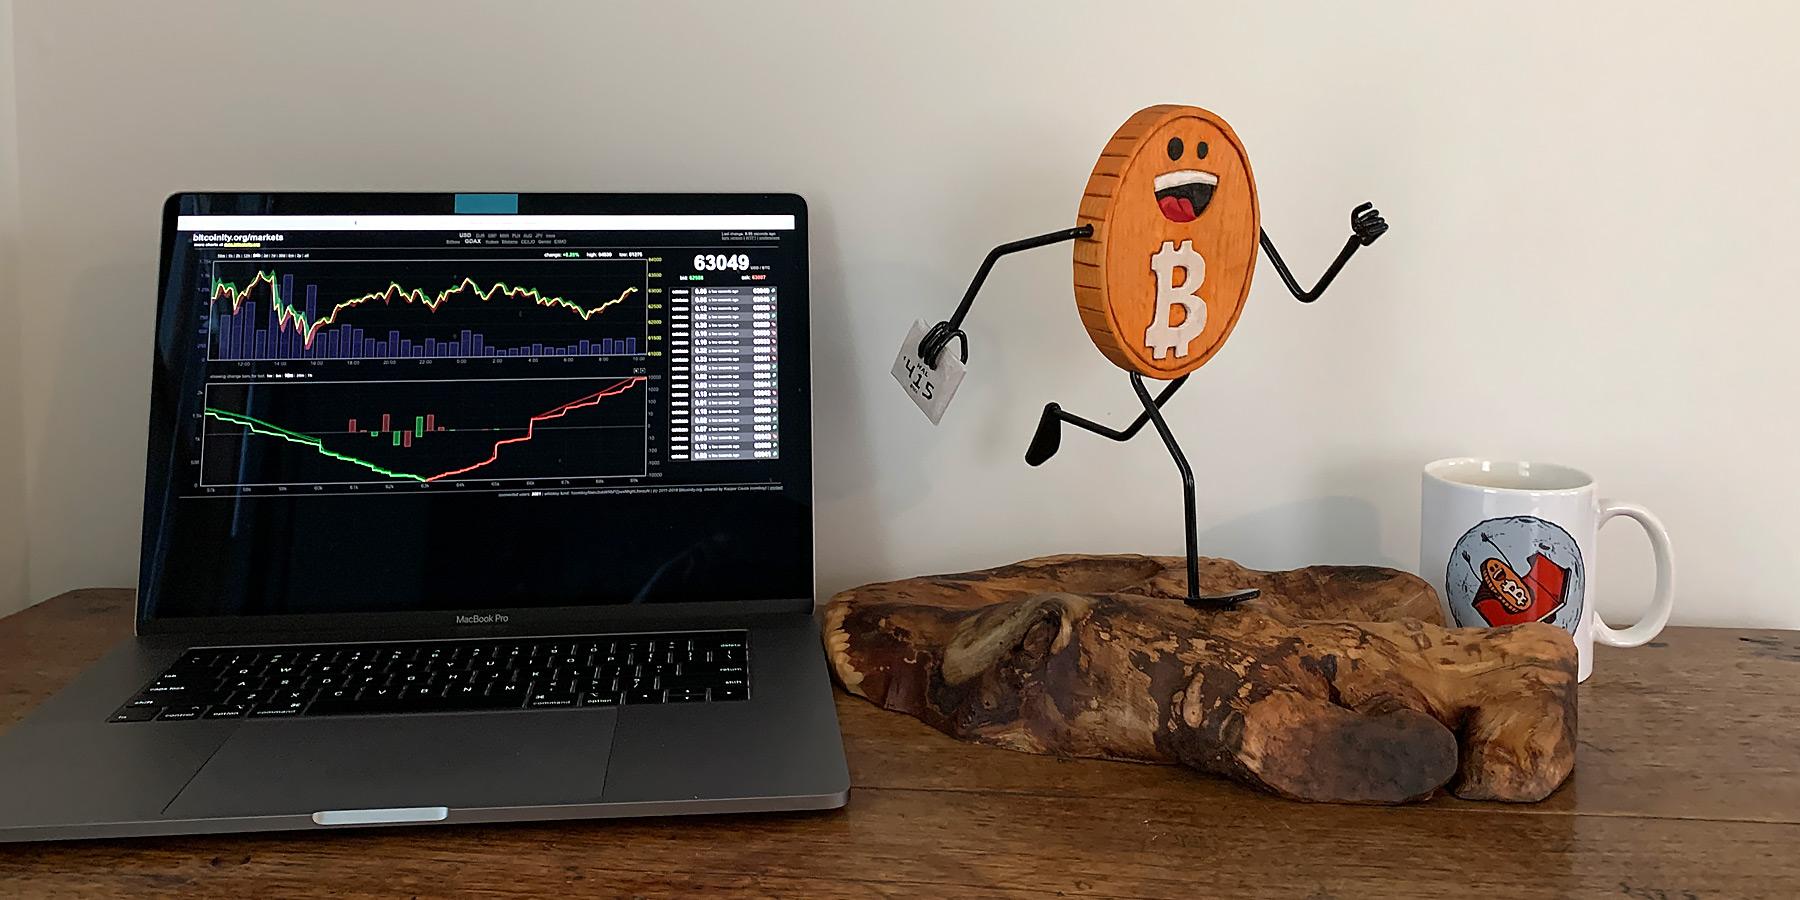 Running Bitcoin sculpture with computer and mug